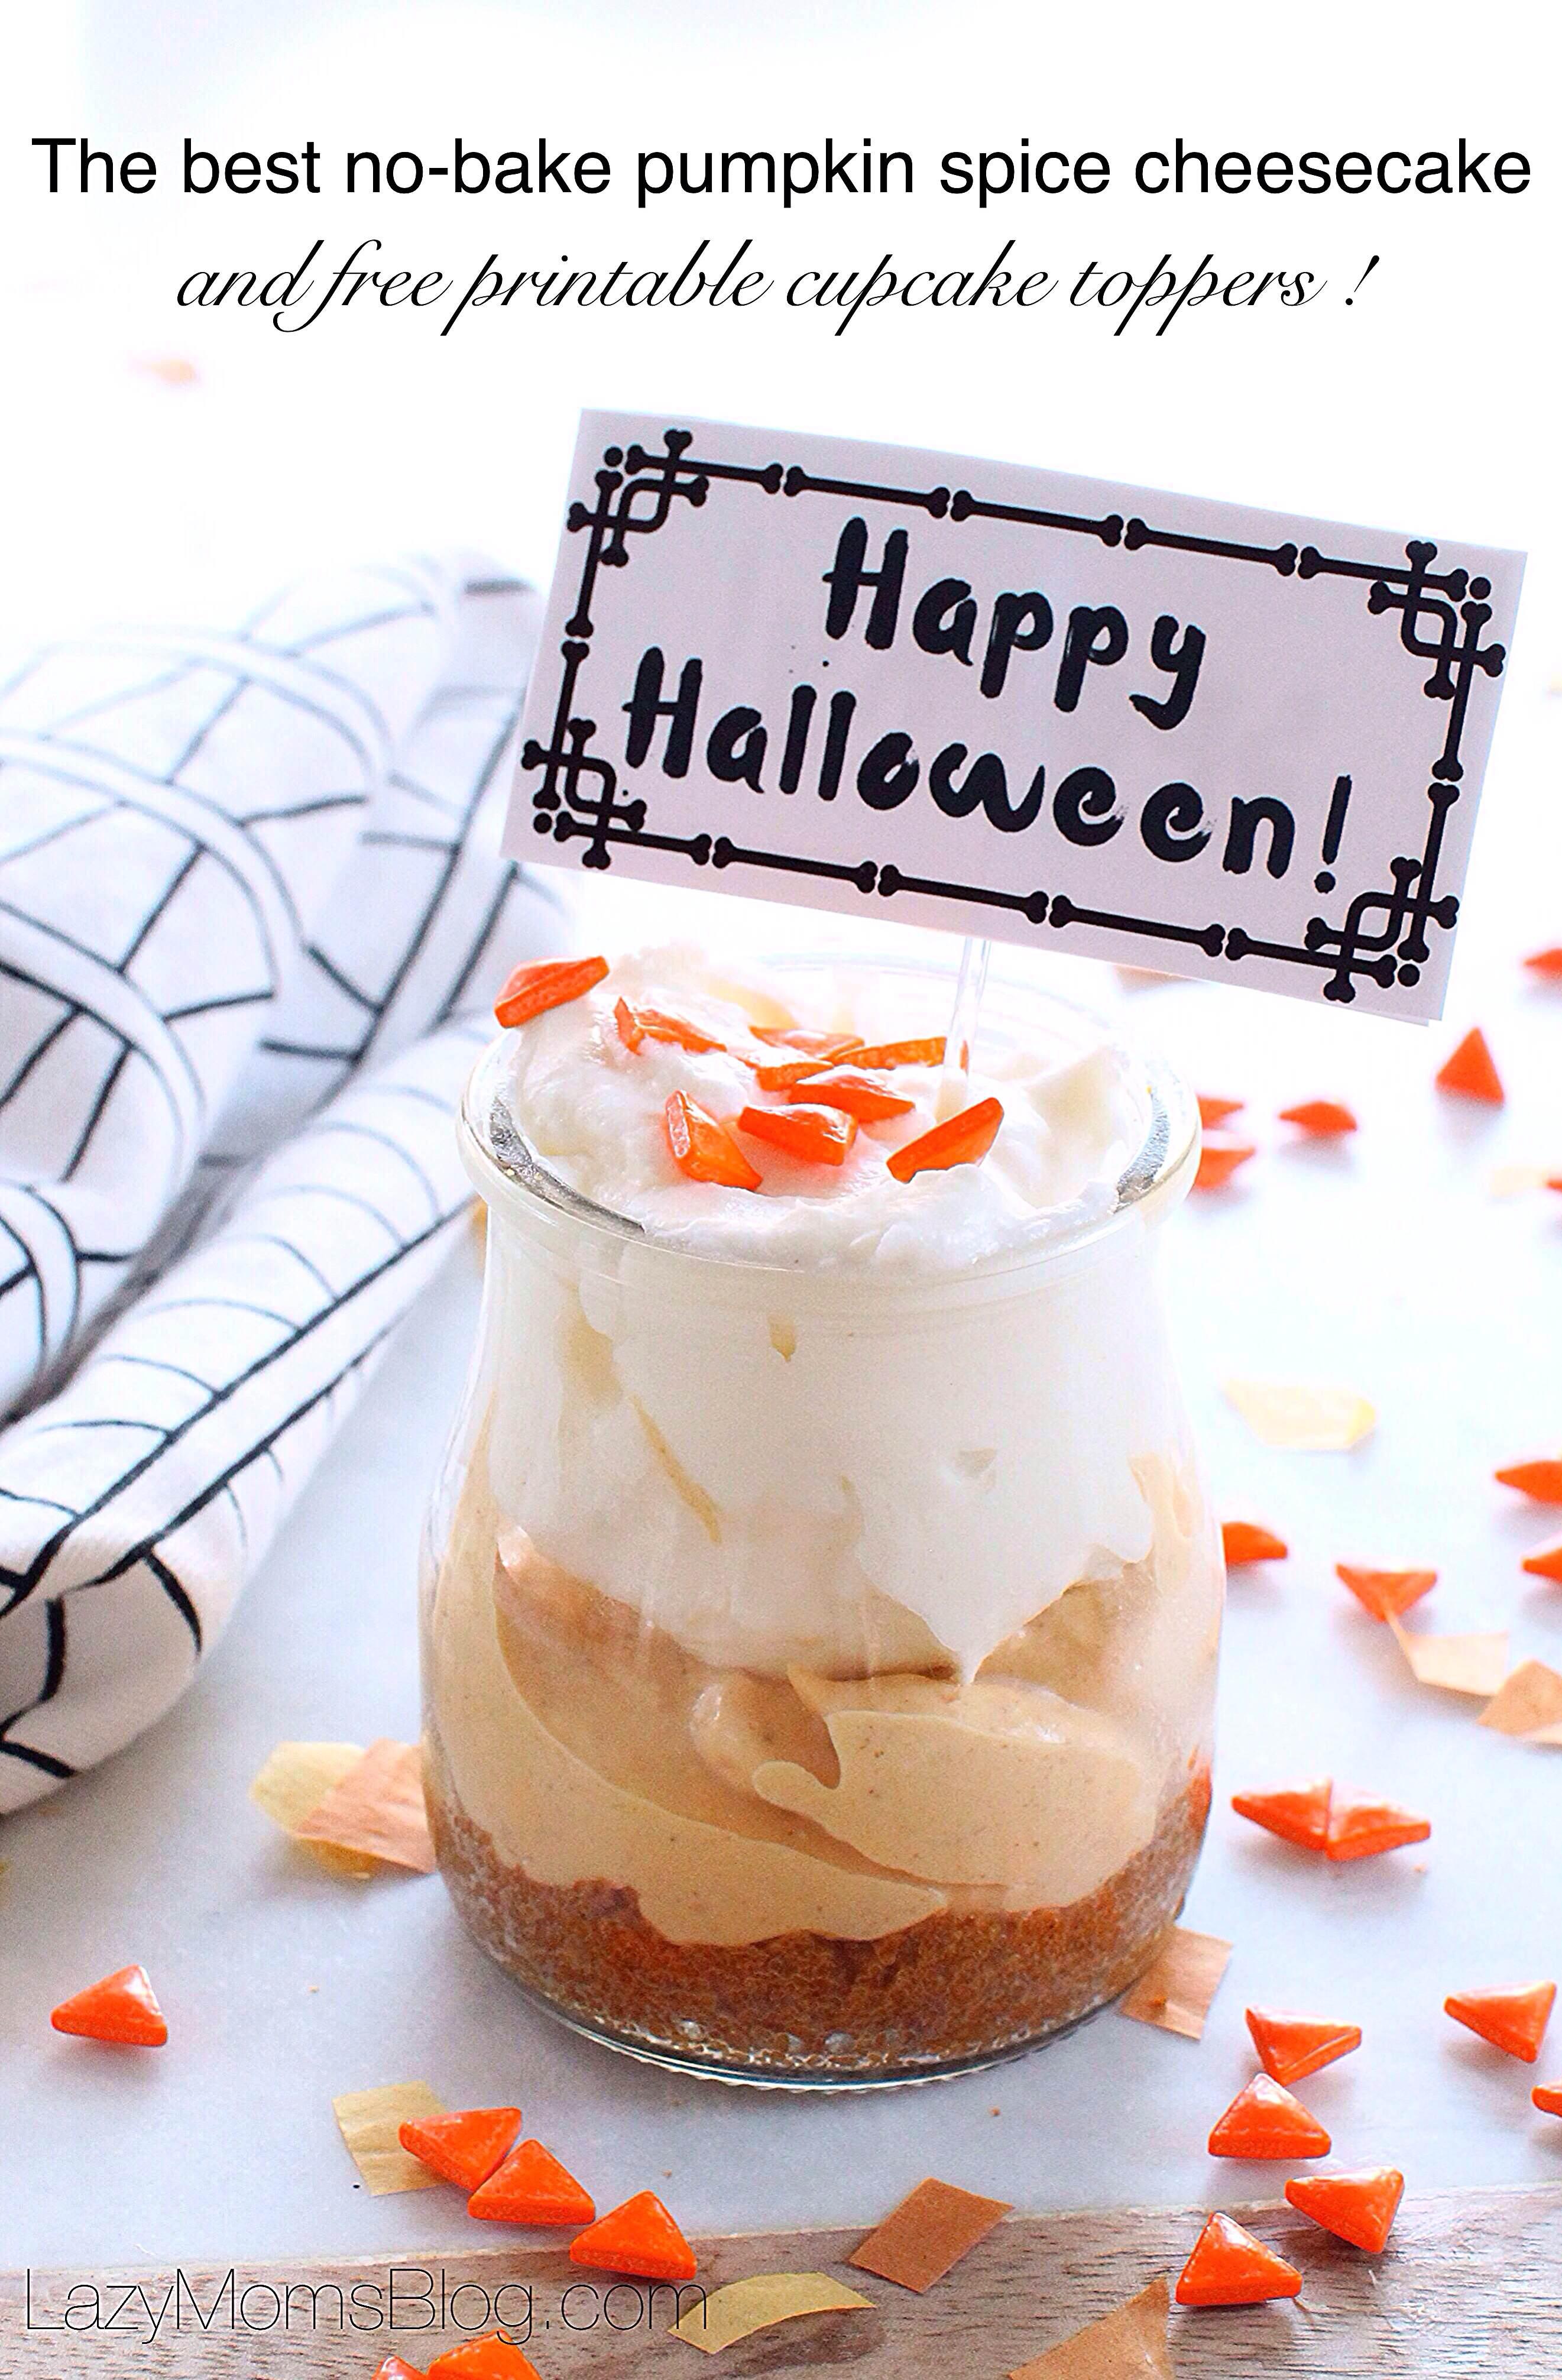 No bake pumpkin cheesecake, Halloween style - Lazy Mom's blog